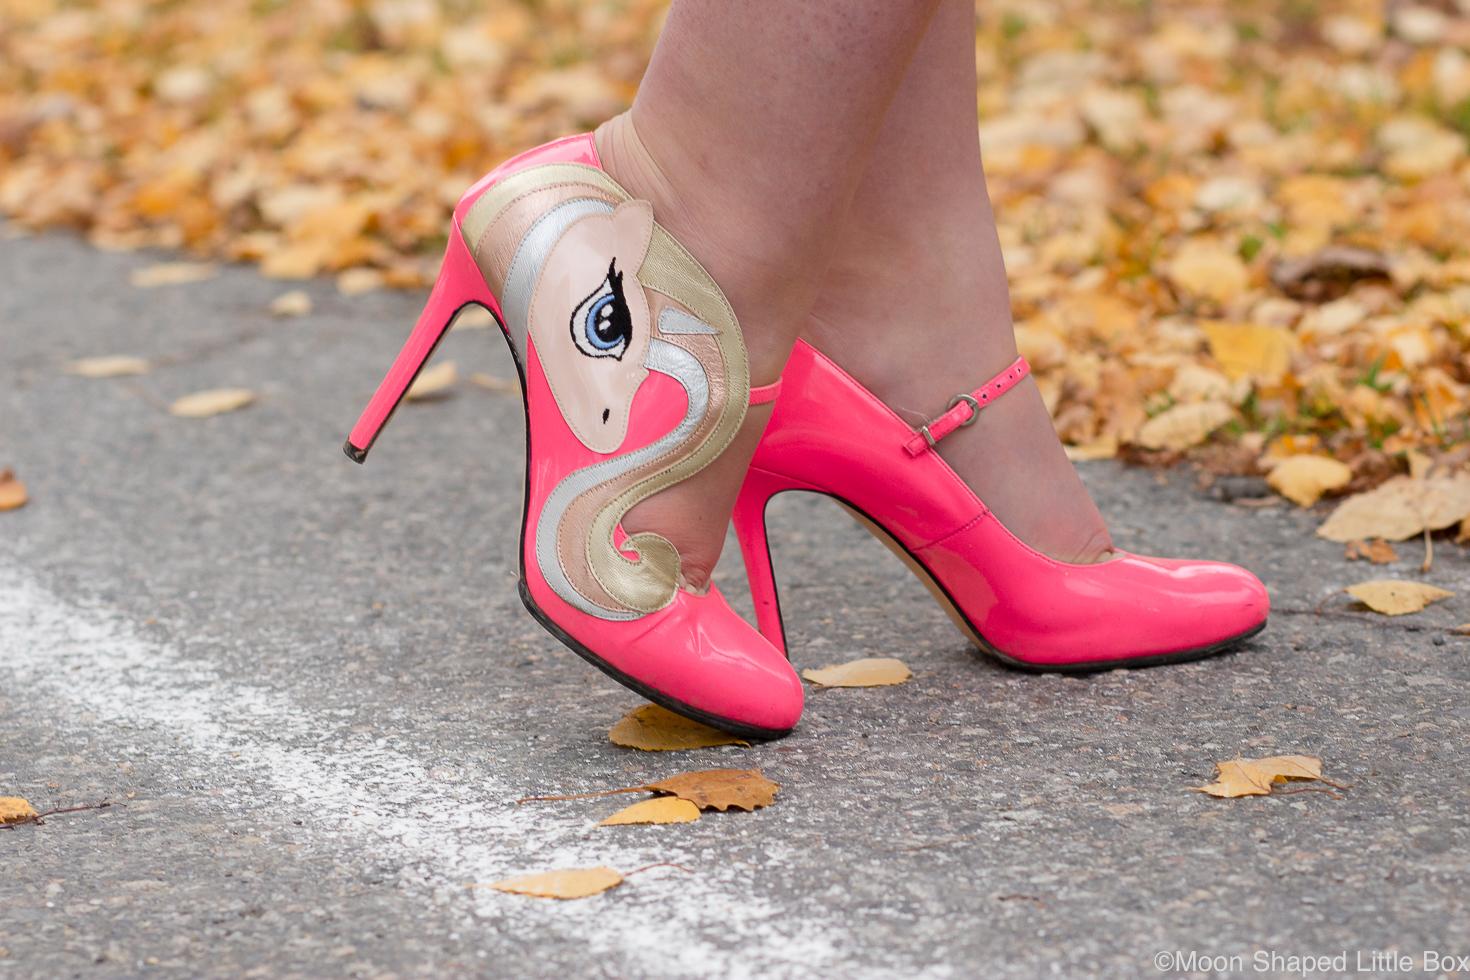 Minna-Parikka-pinkit-Celestia-kengat